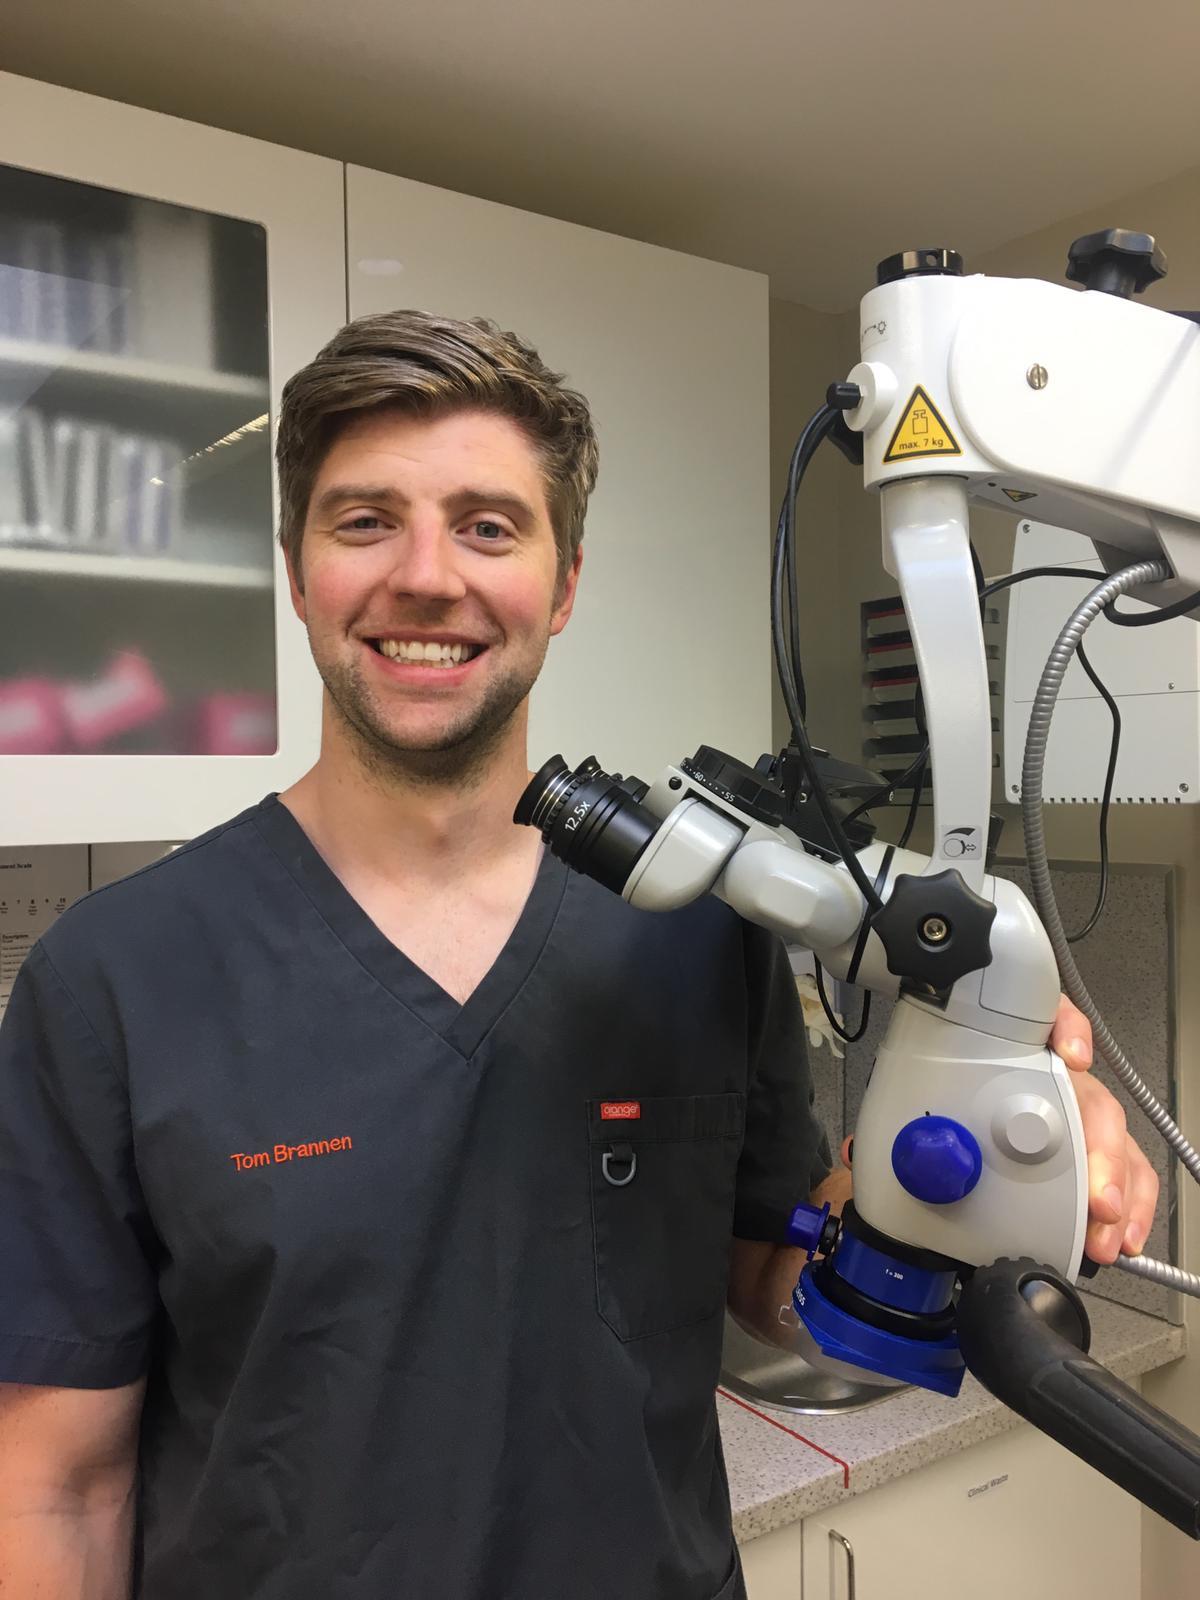 Dr Tom Brannen